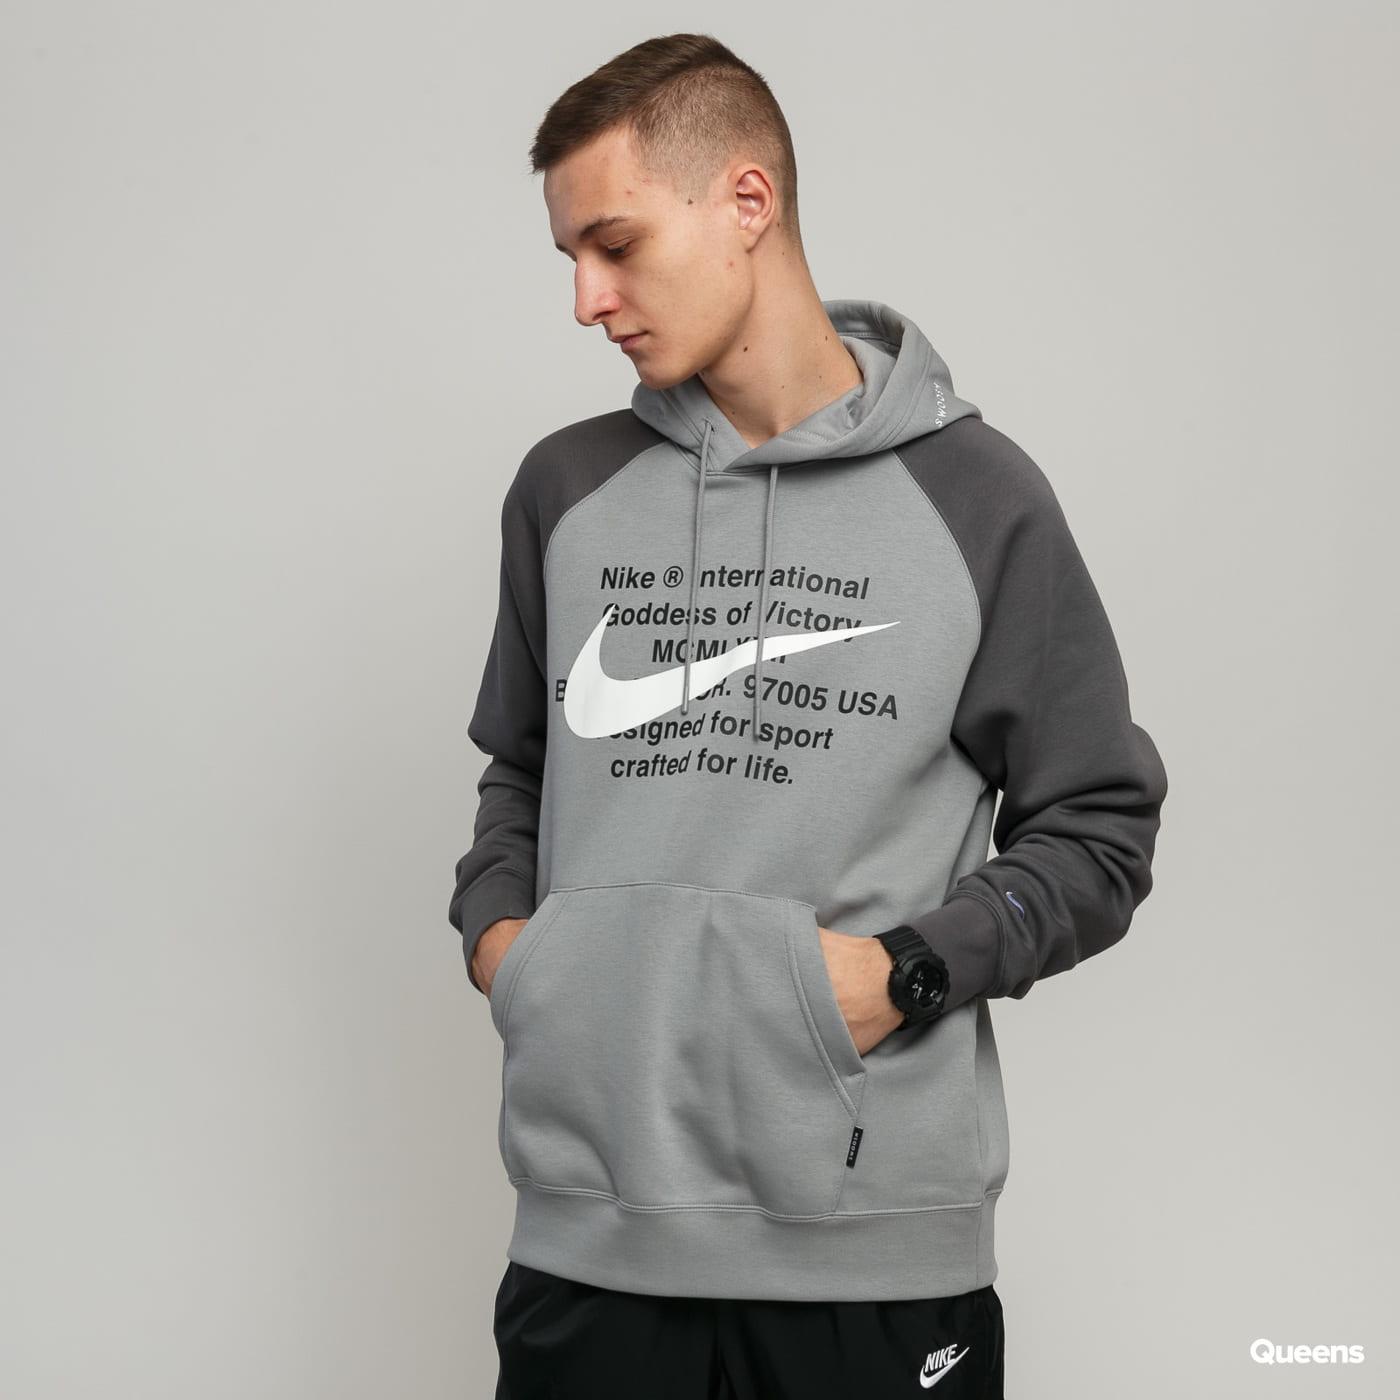 nike swoosh hoodie dress